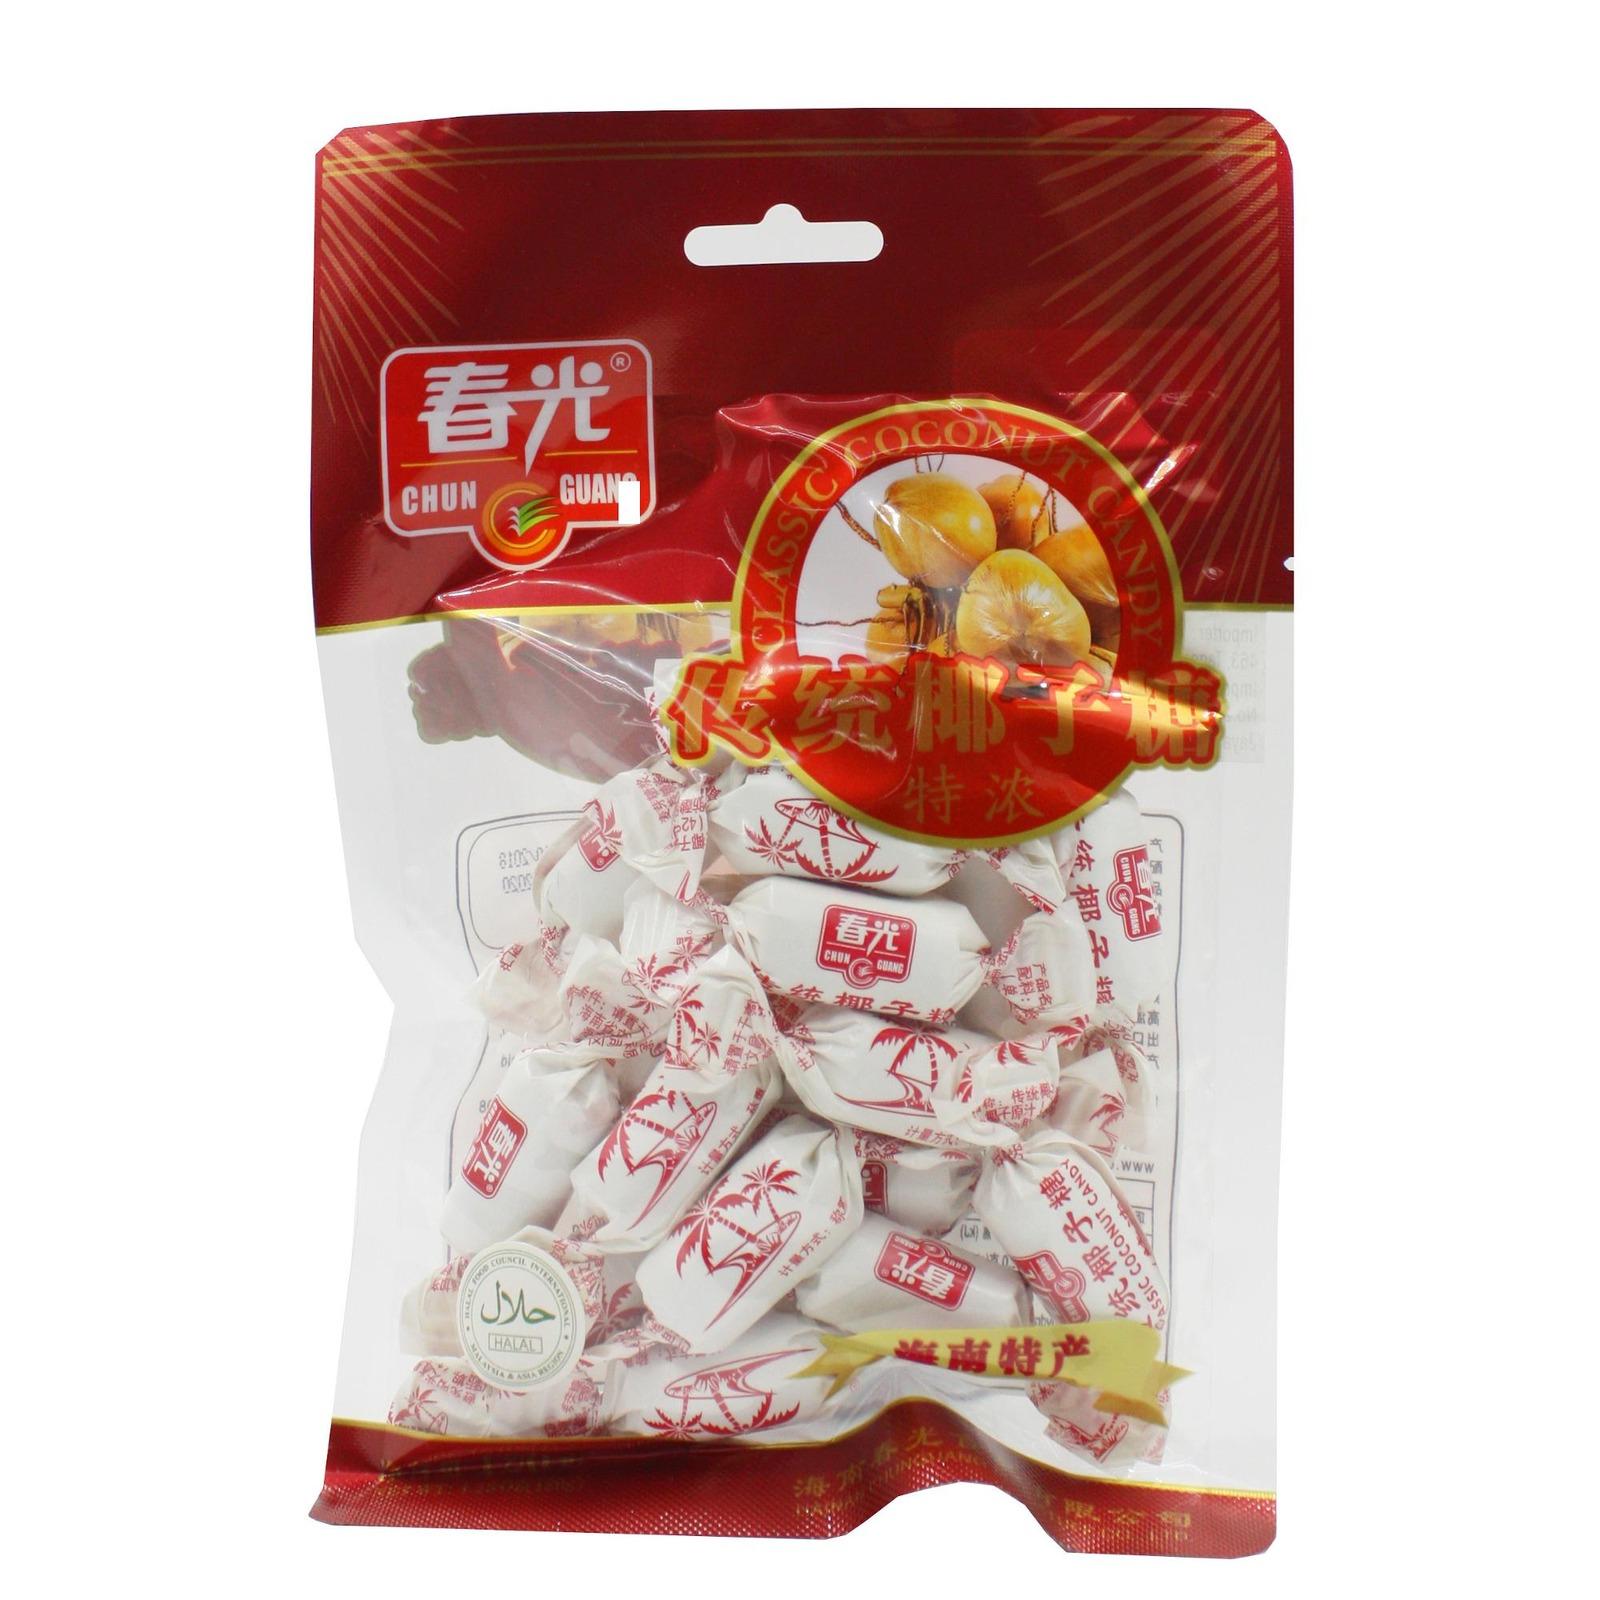 CHUN GUANG CLASSIC COCONUT CANDY